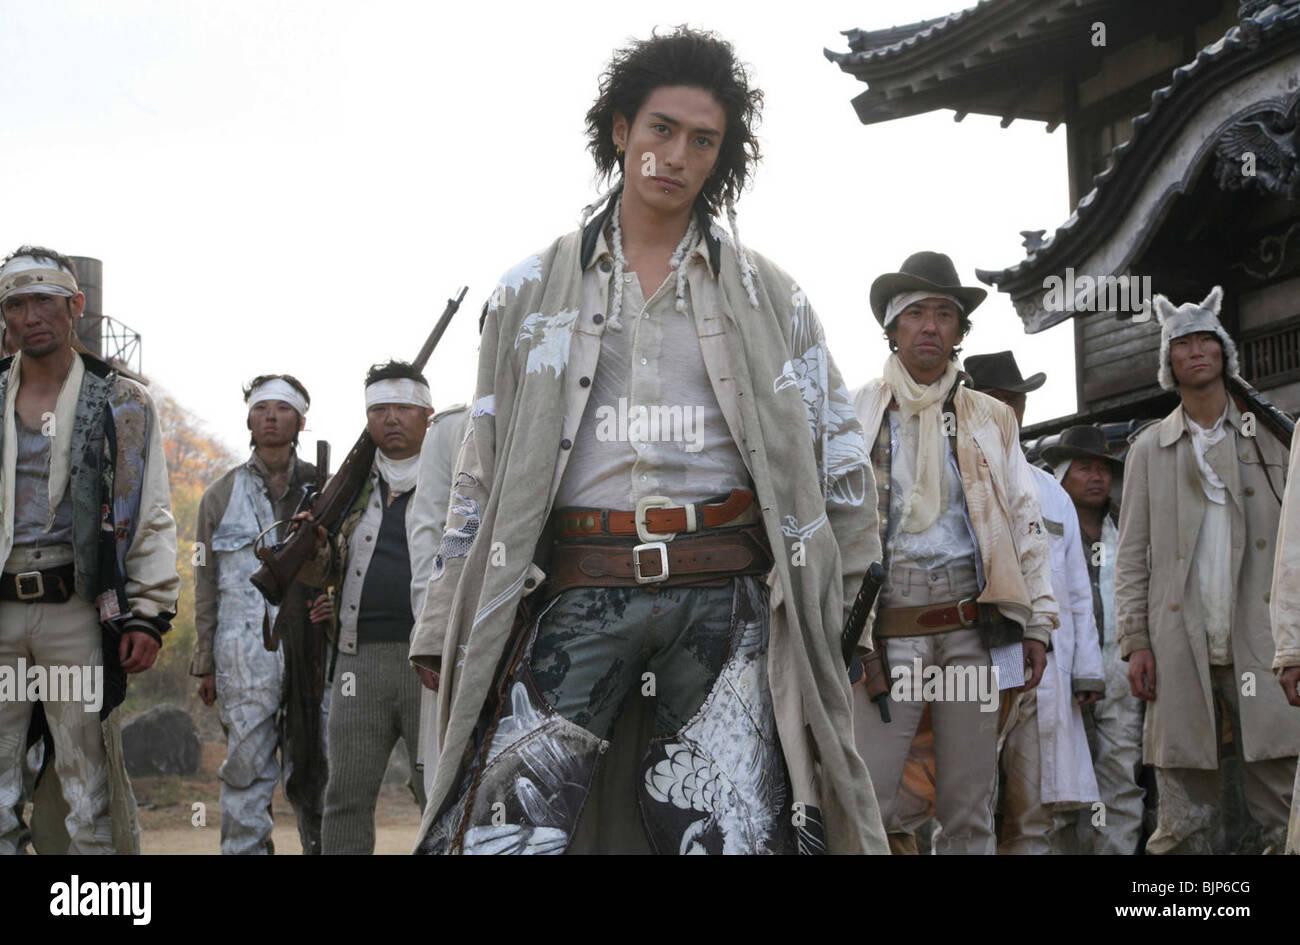 SUKIYAKI WESTERN DJANGO (2007) TAKASHI MIIKE (DIR) 001 - Stock Image